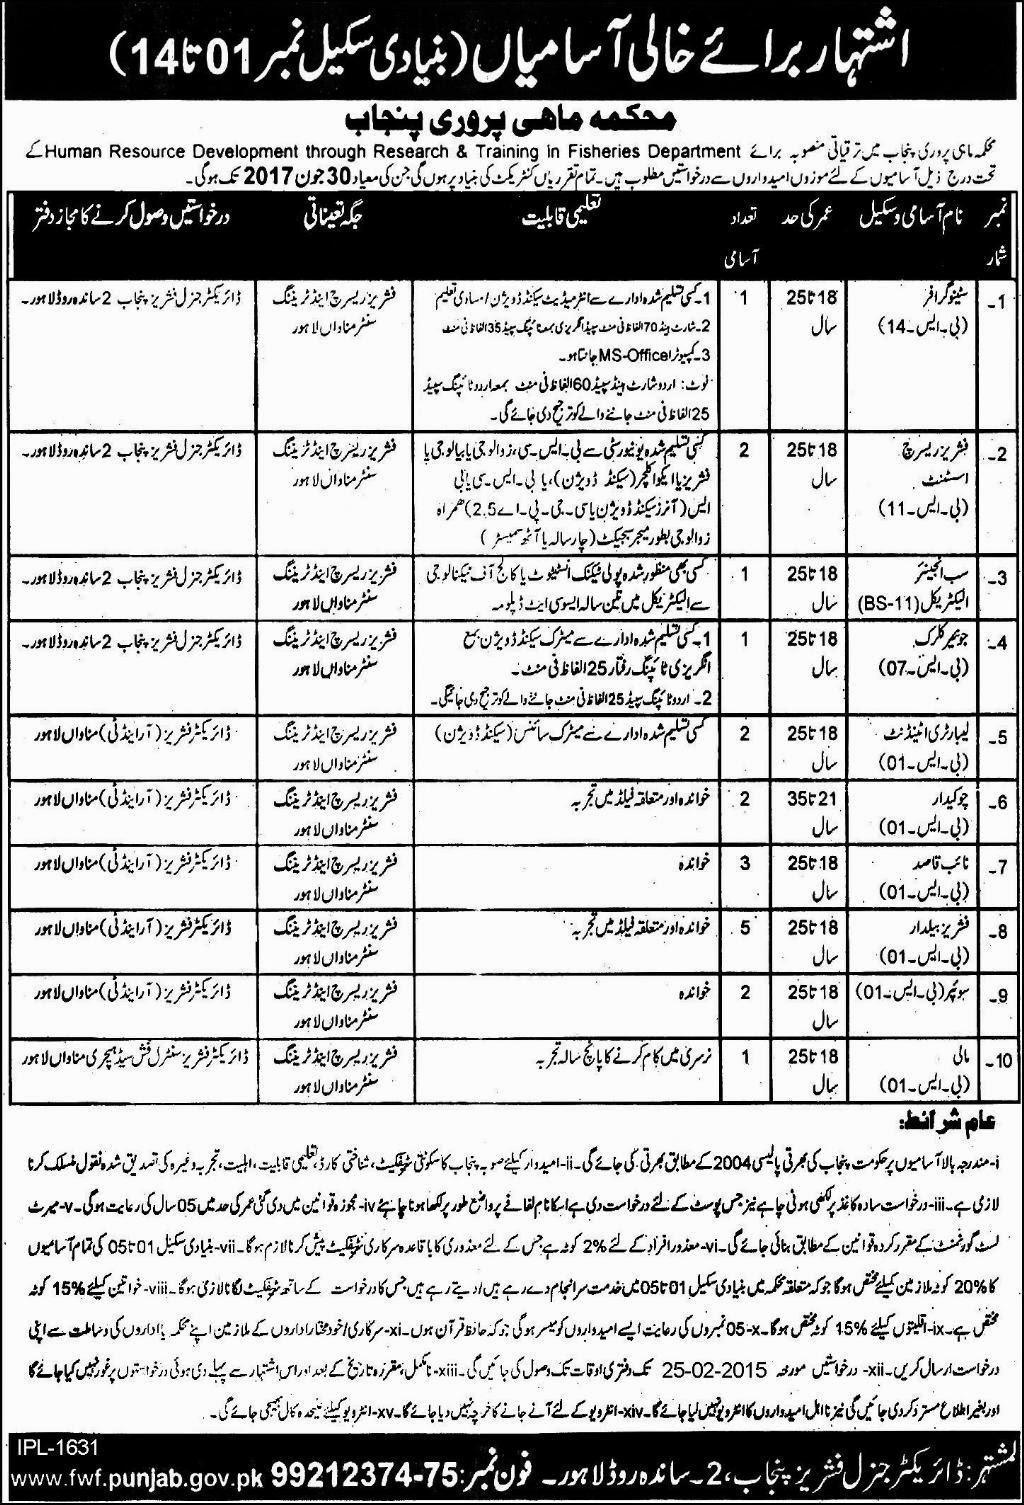 Govt of Punjab Fisheries Department Jobs